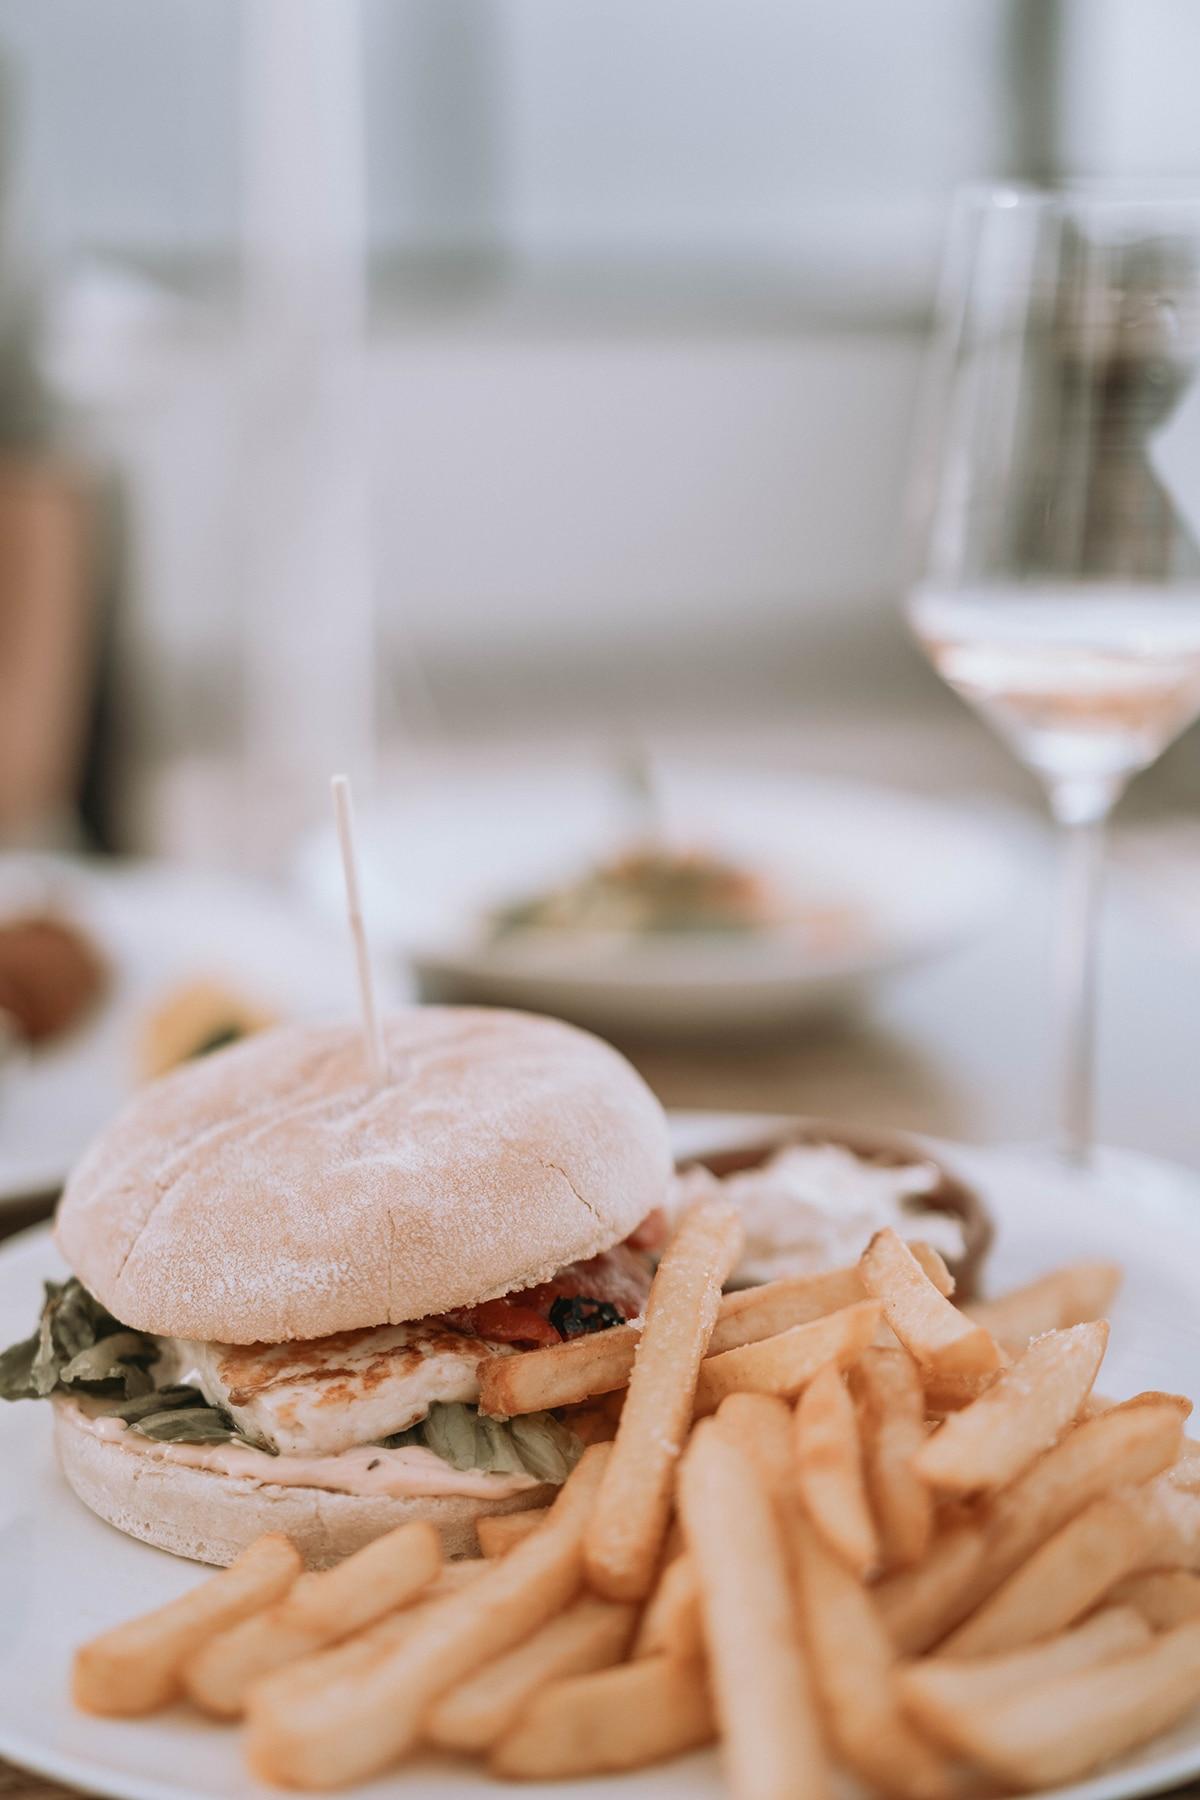 amrum-strand-33-burger